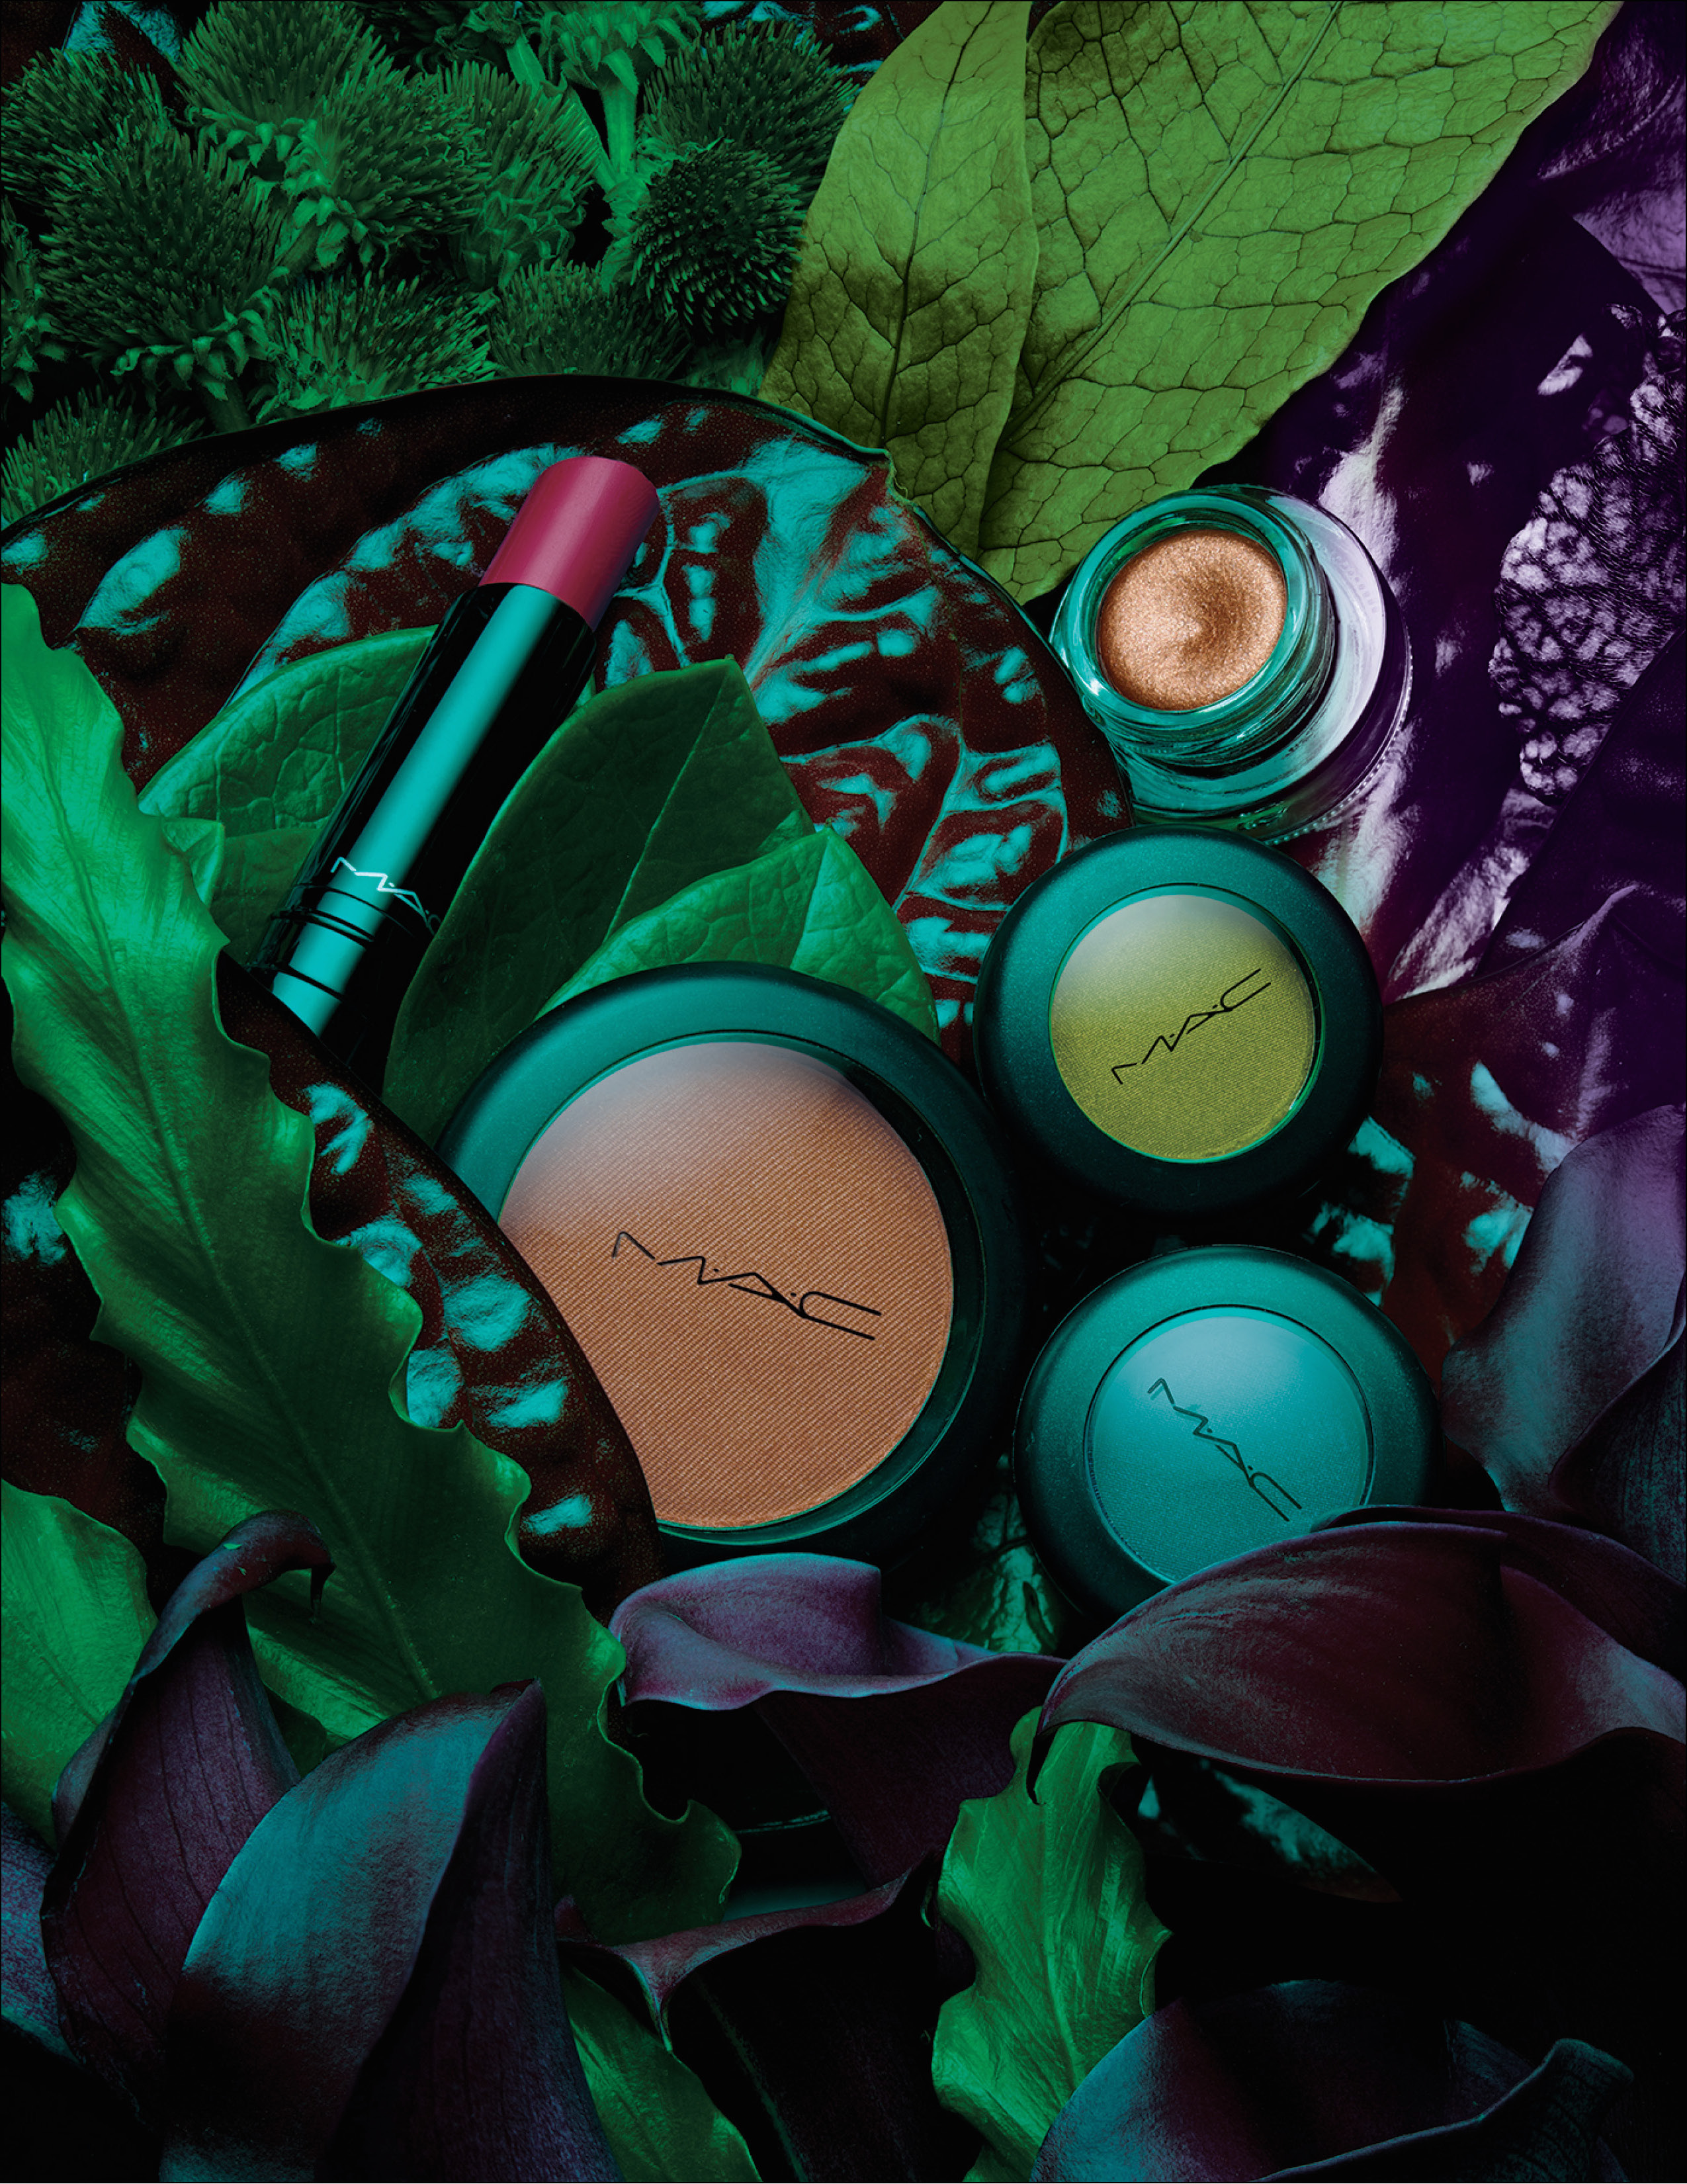 MAC MoodyBlooms Ambient slika 01 MAC Cosmetics: Nova kolekcija Moody Blooms